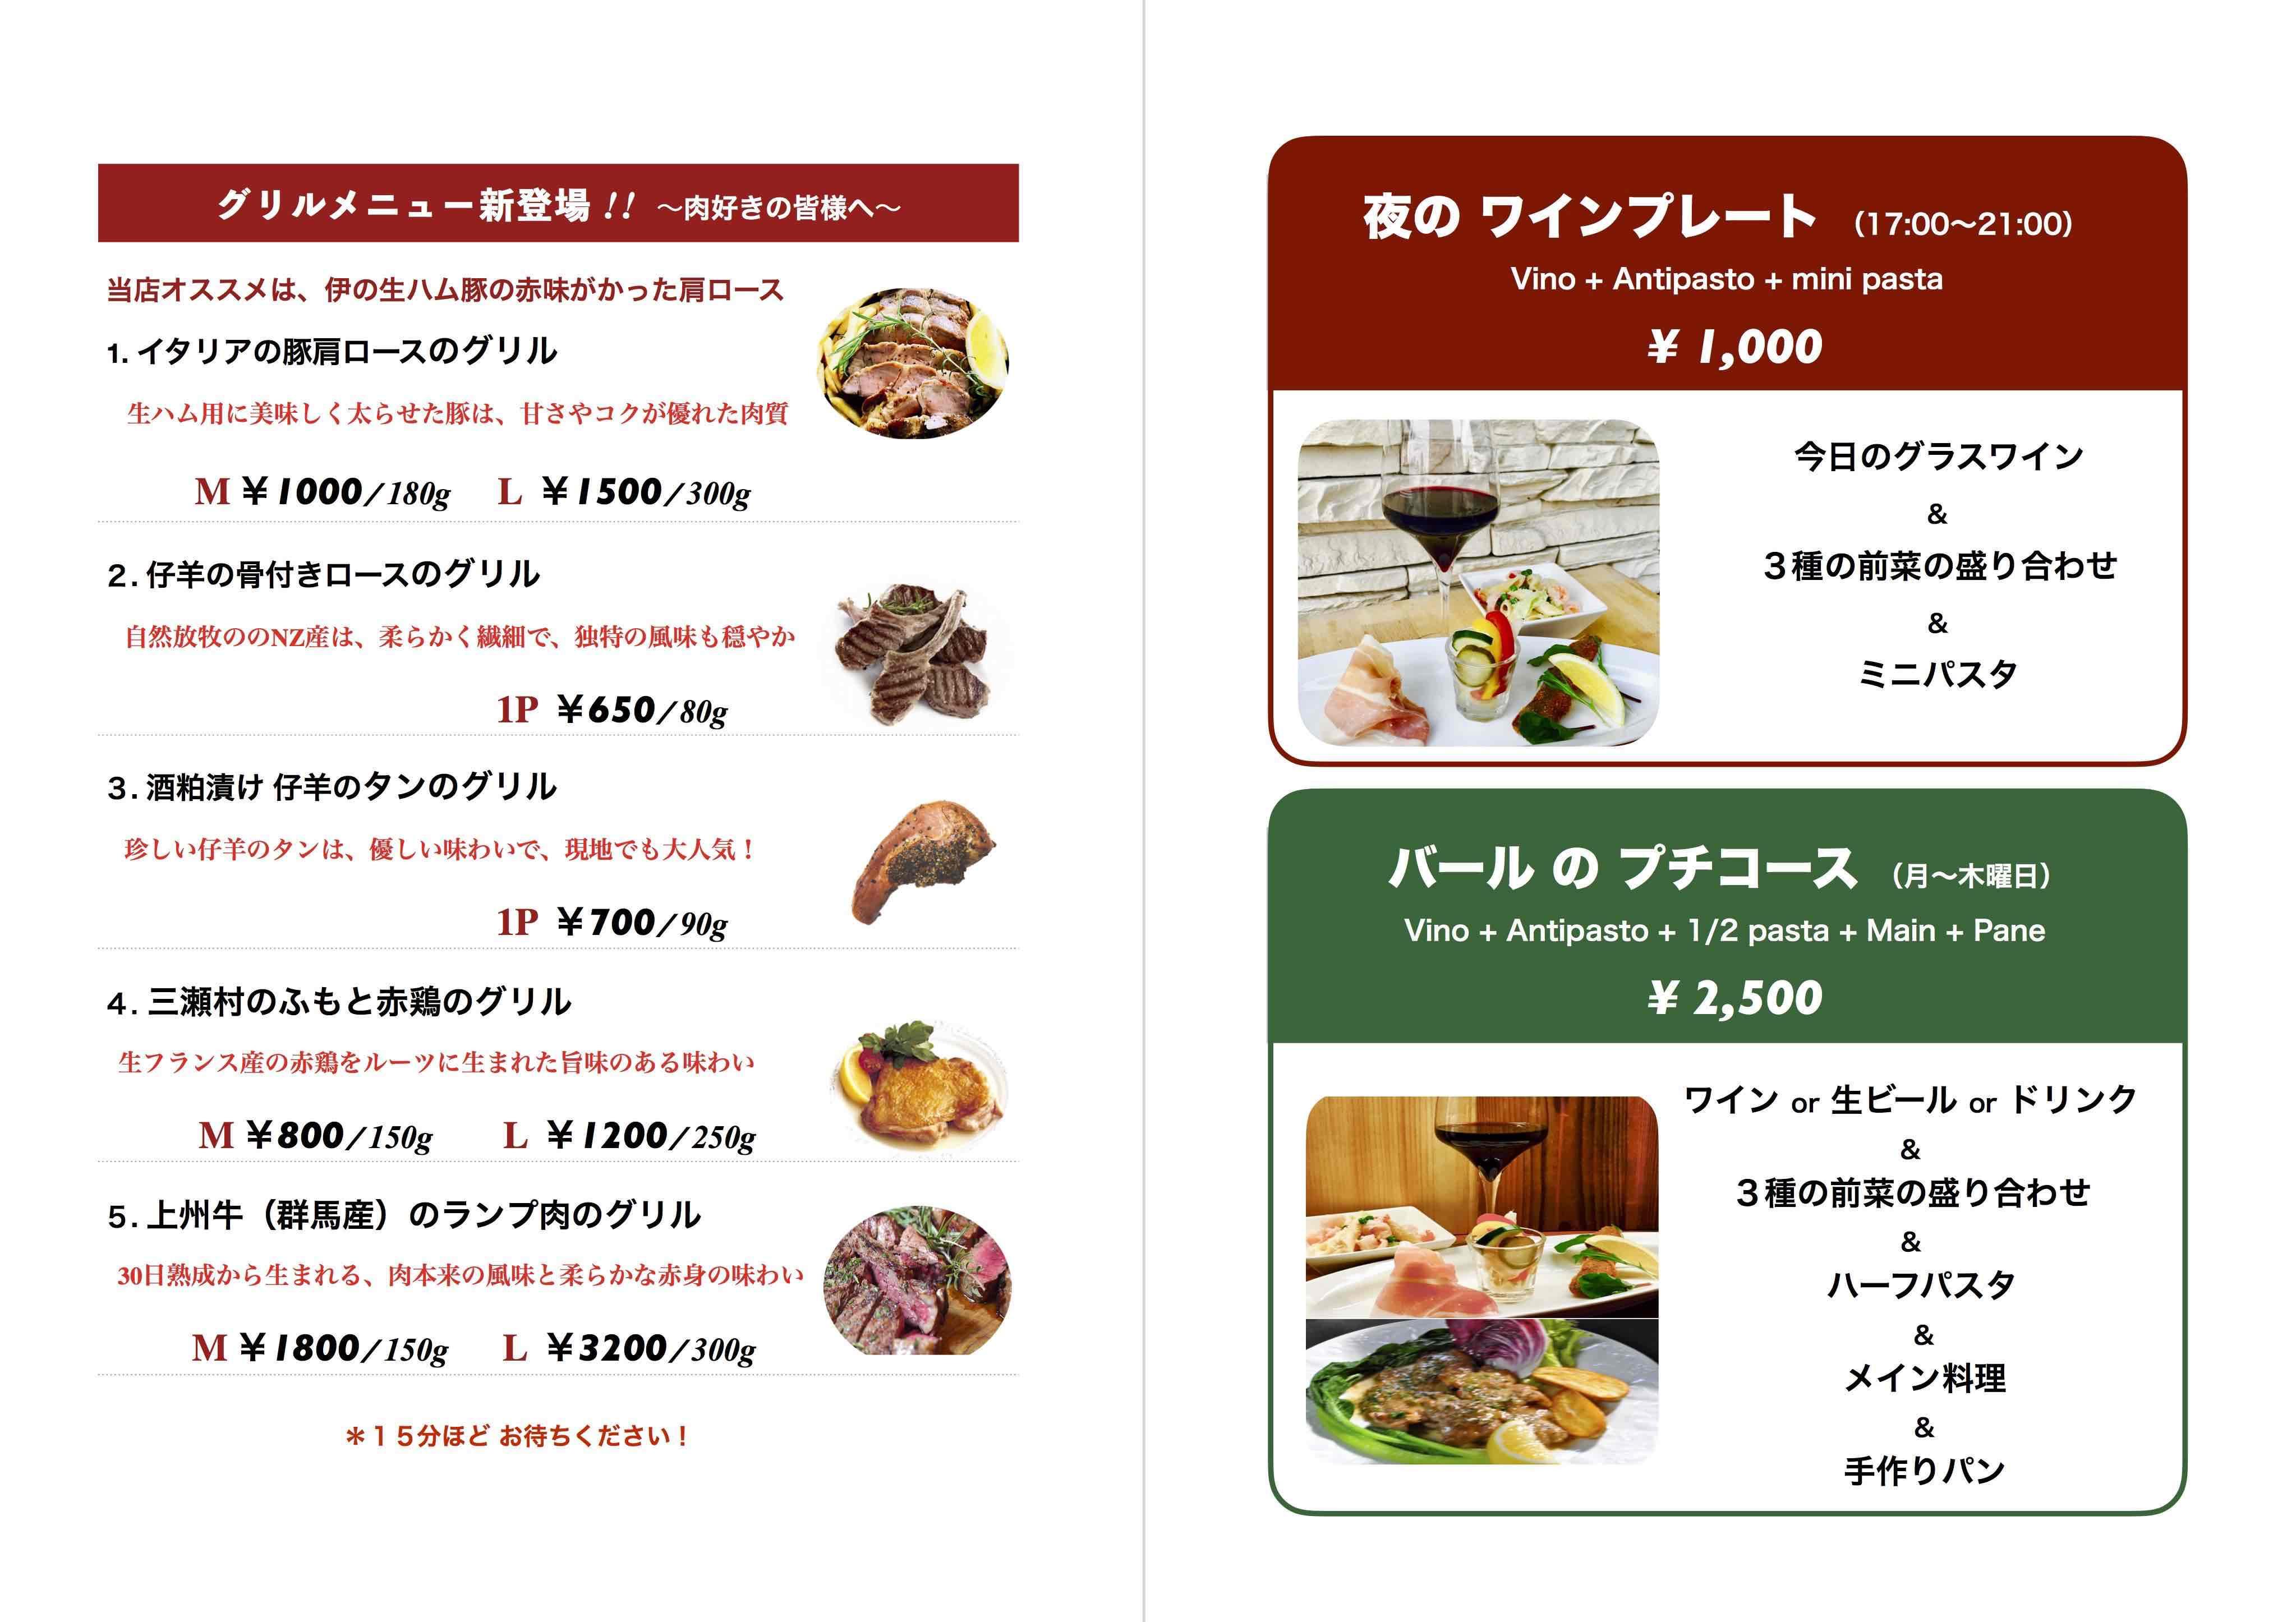 2017_03bar新メニューA4_春夏印刷1pages.jpg